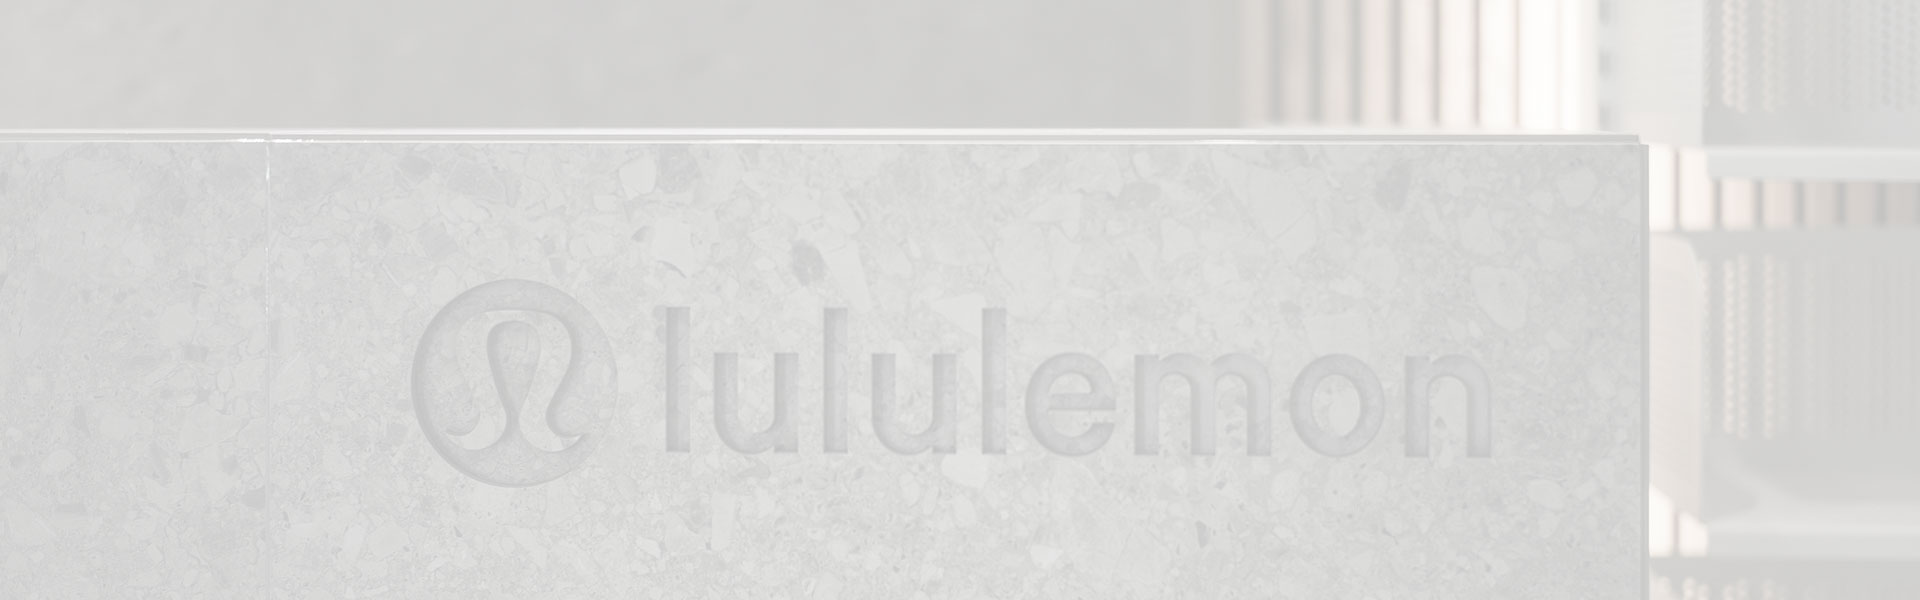 lululemon – Beijing Indigo